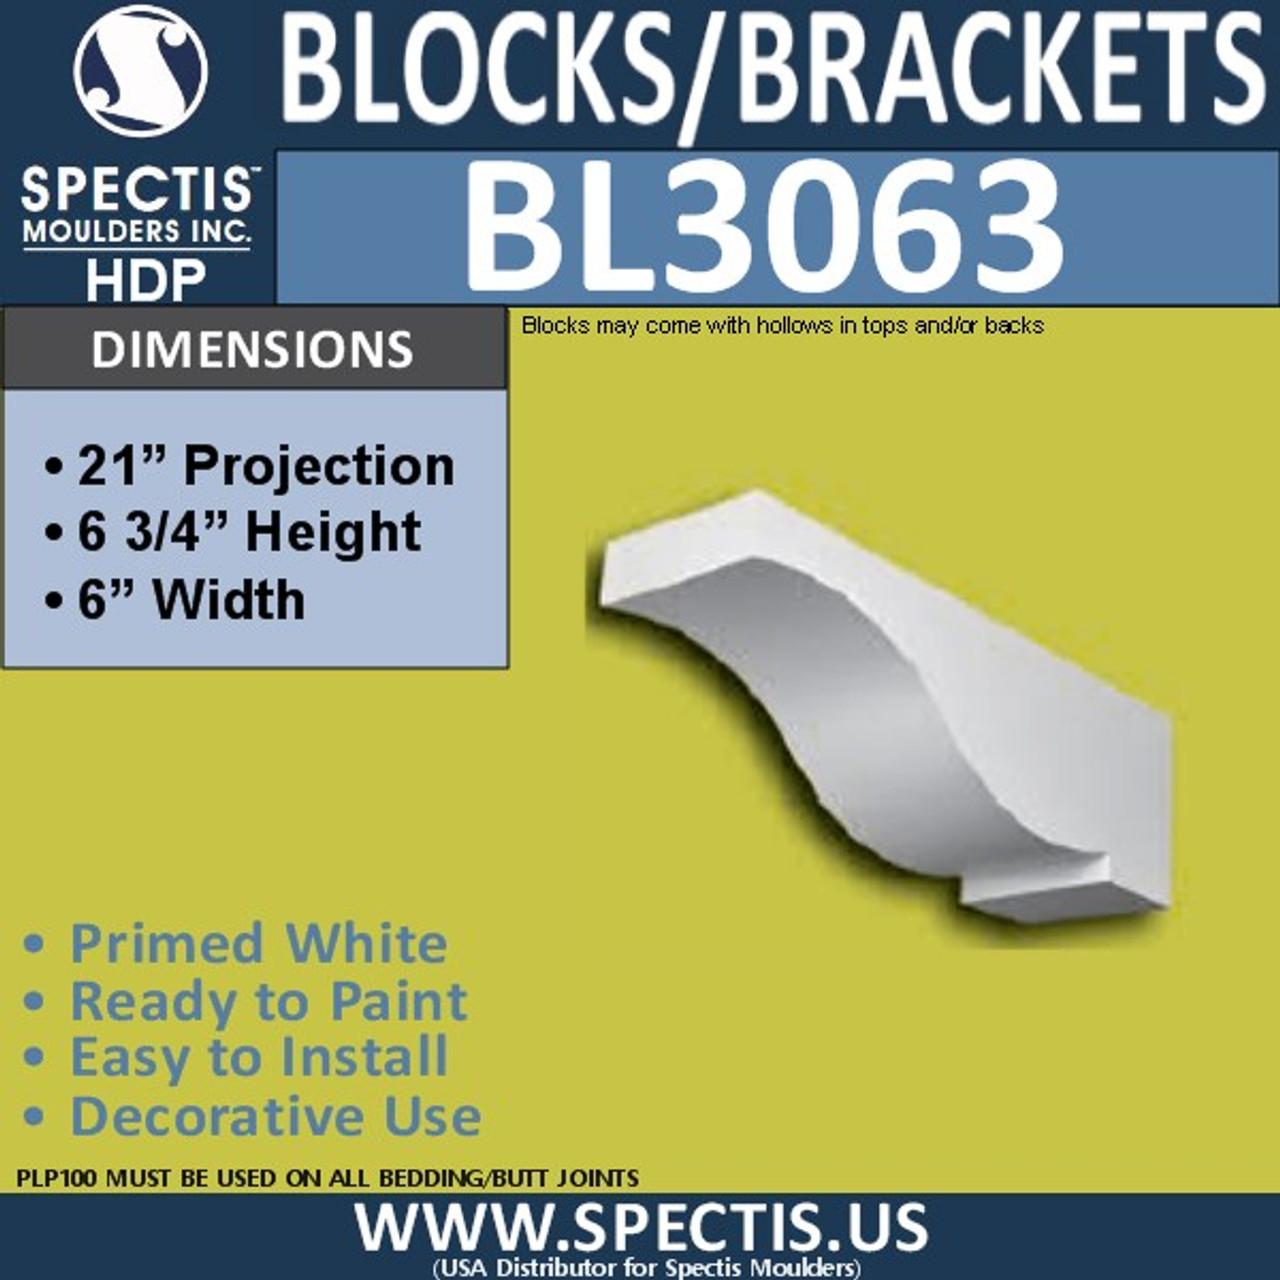 "BL3063 Eave Block or Bracket 8""W x 21""H x 6.75"" P"